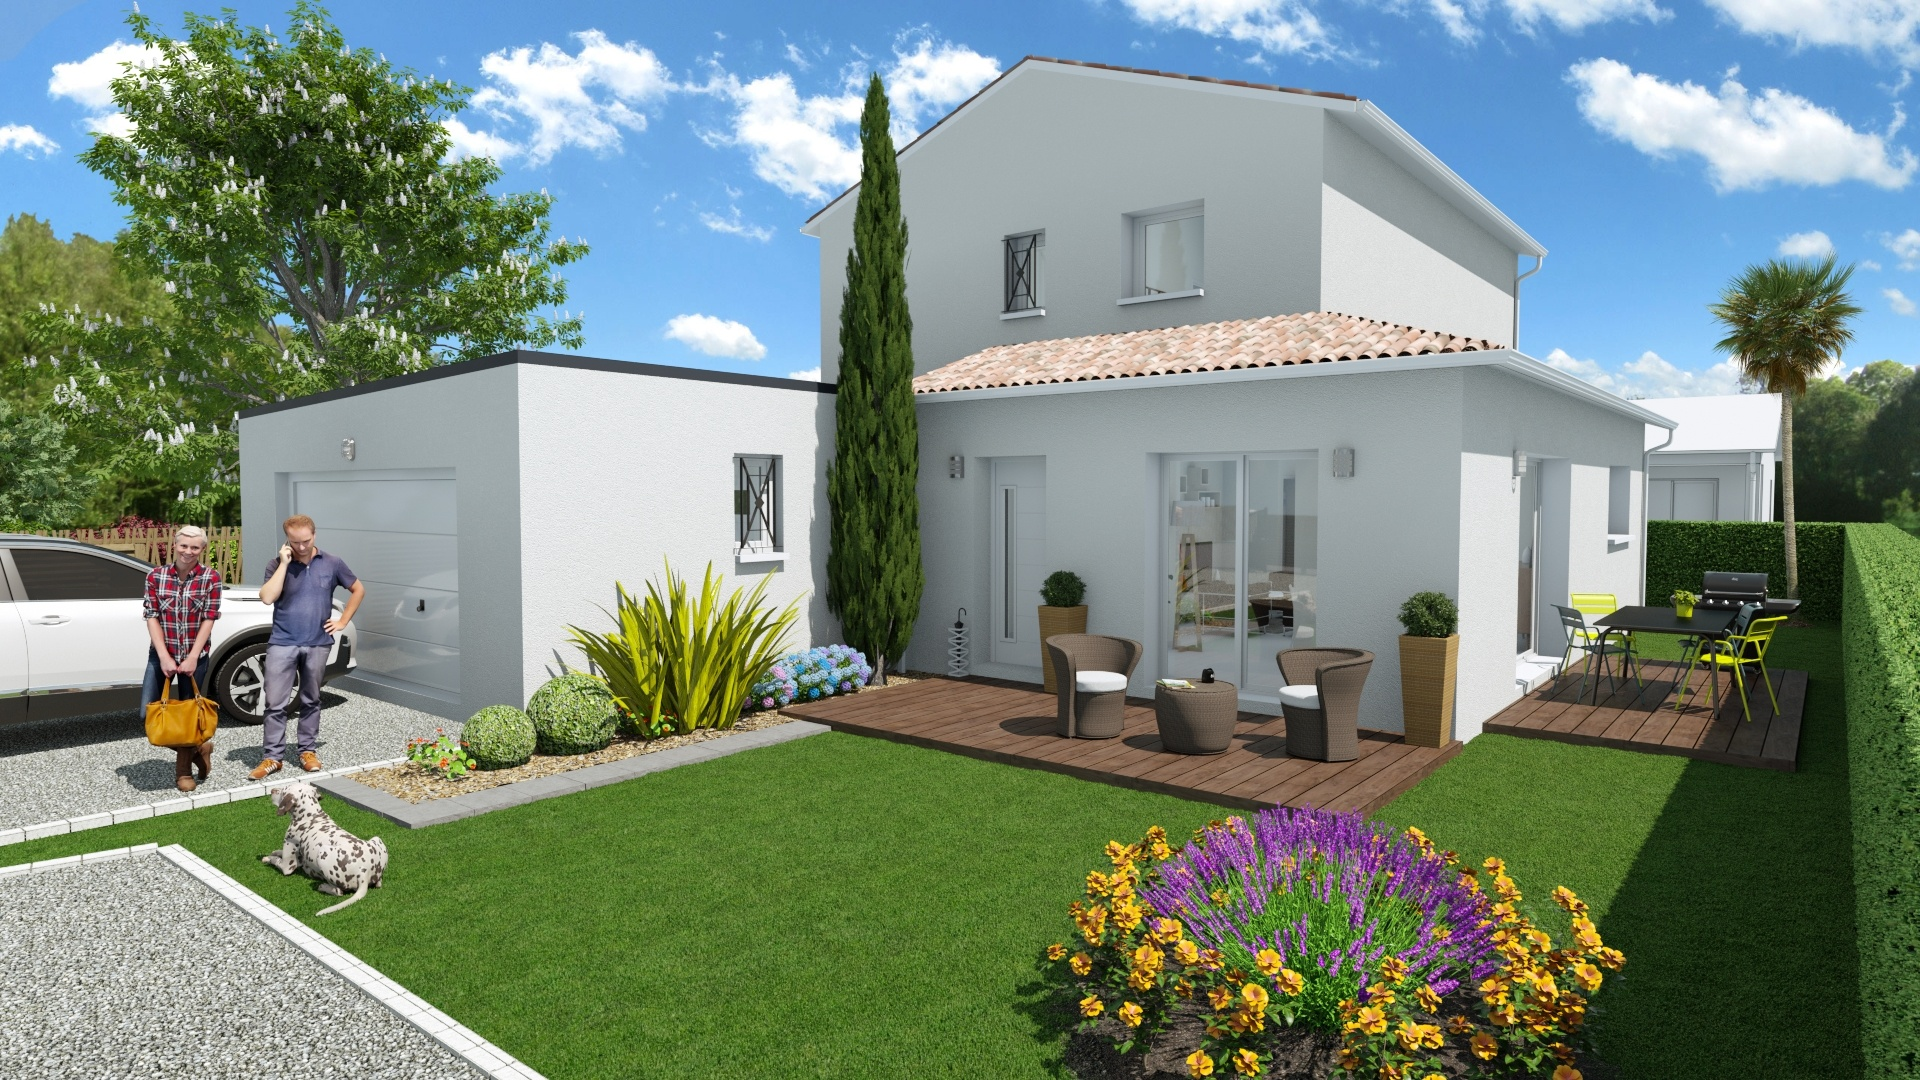 Programme immobilier neuf Maison à Gargas